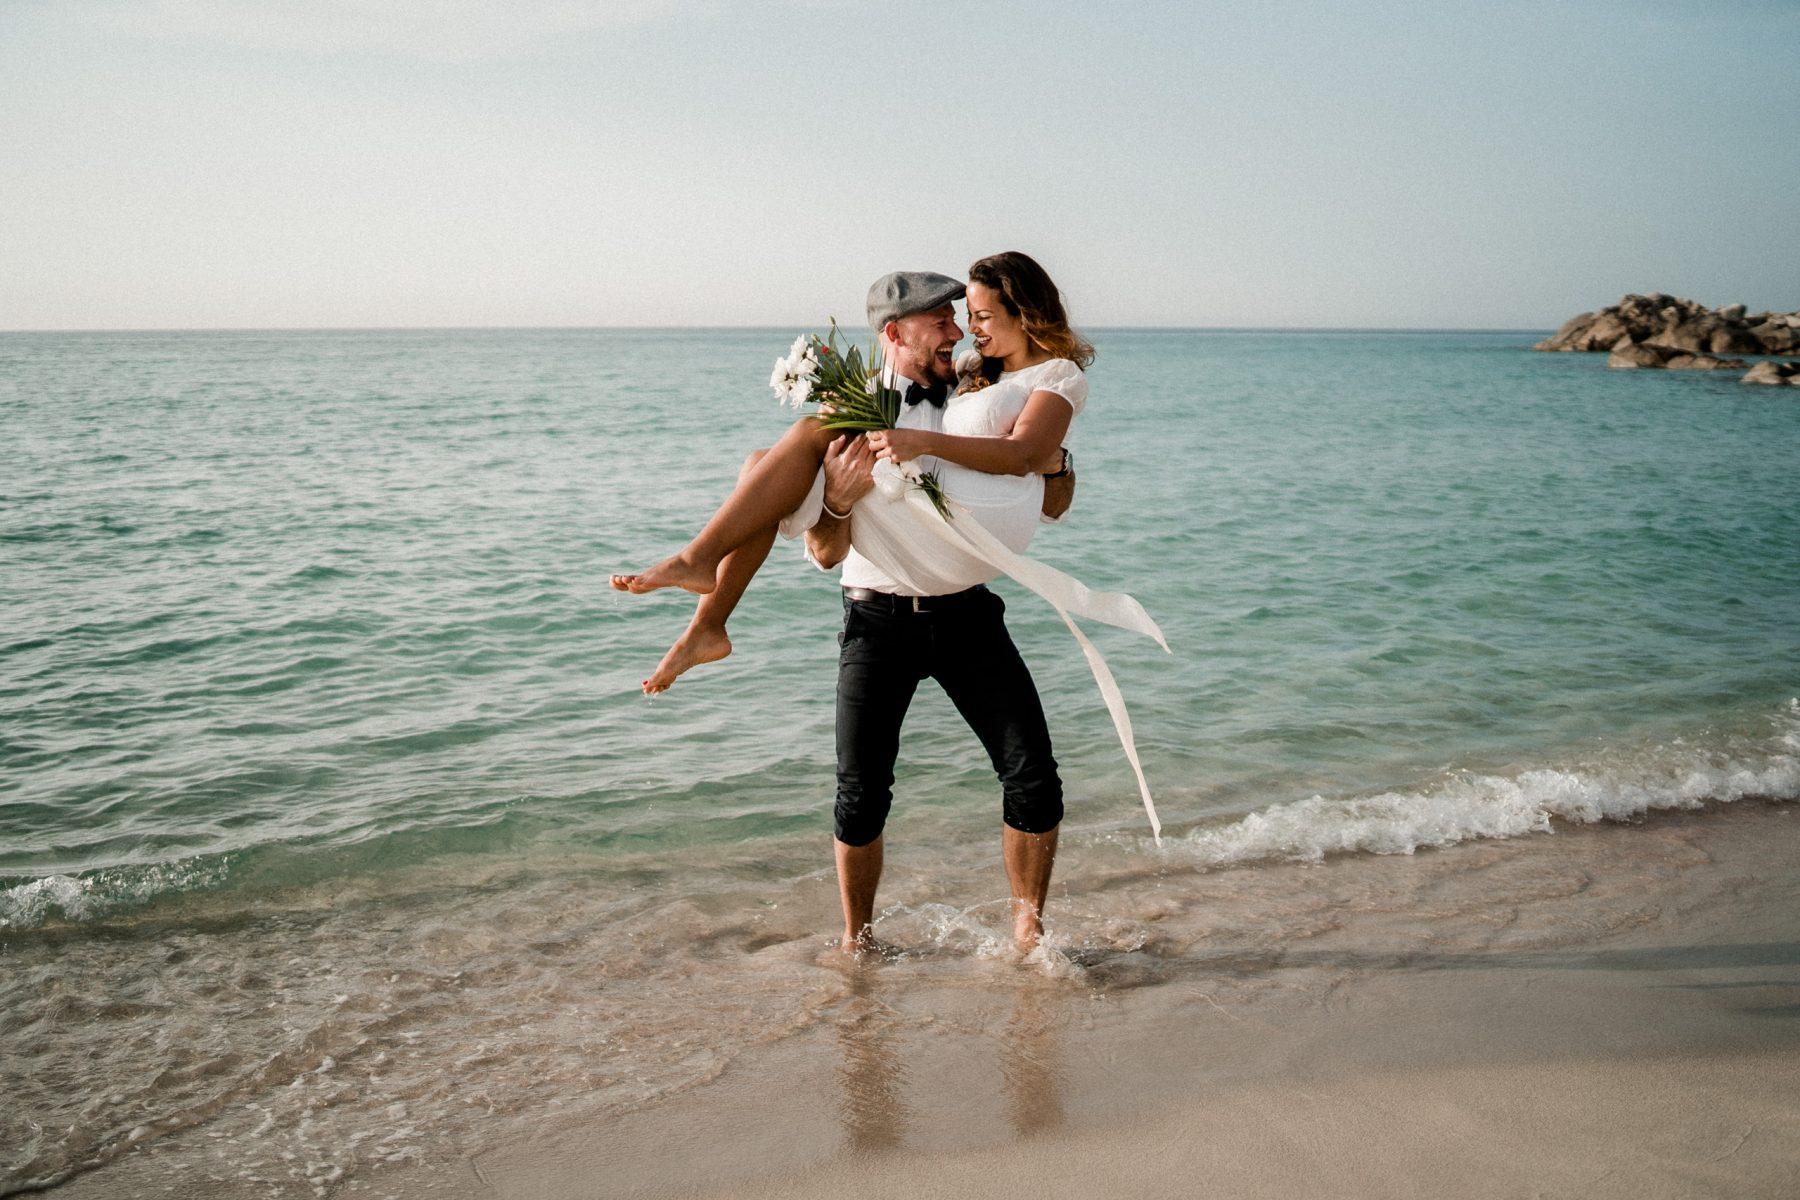 Bride and Groom having fun on the beach